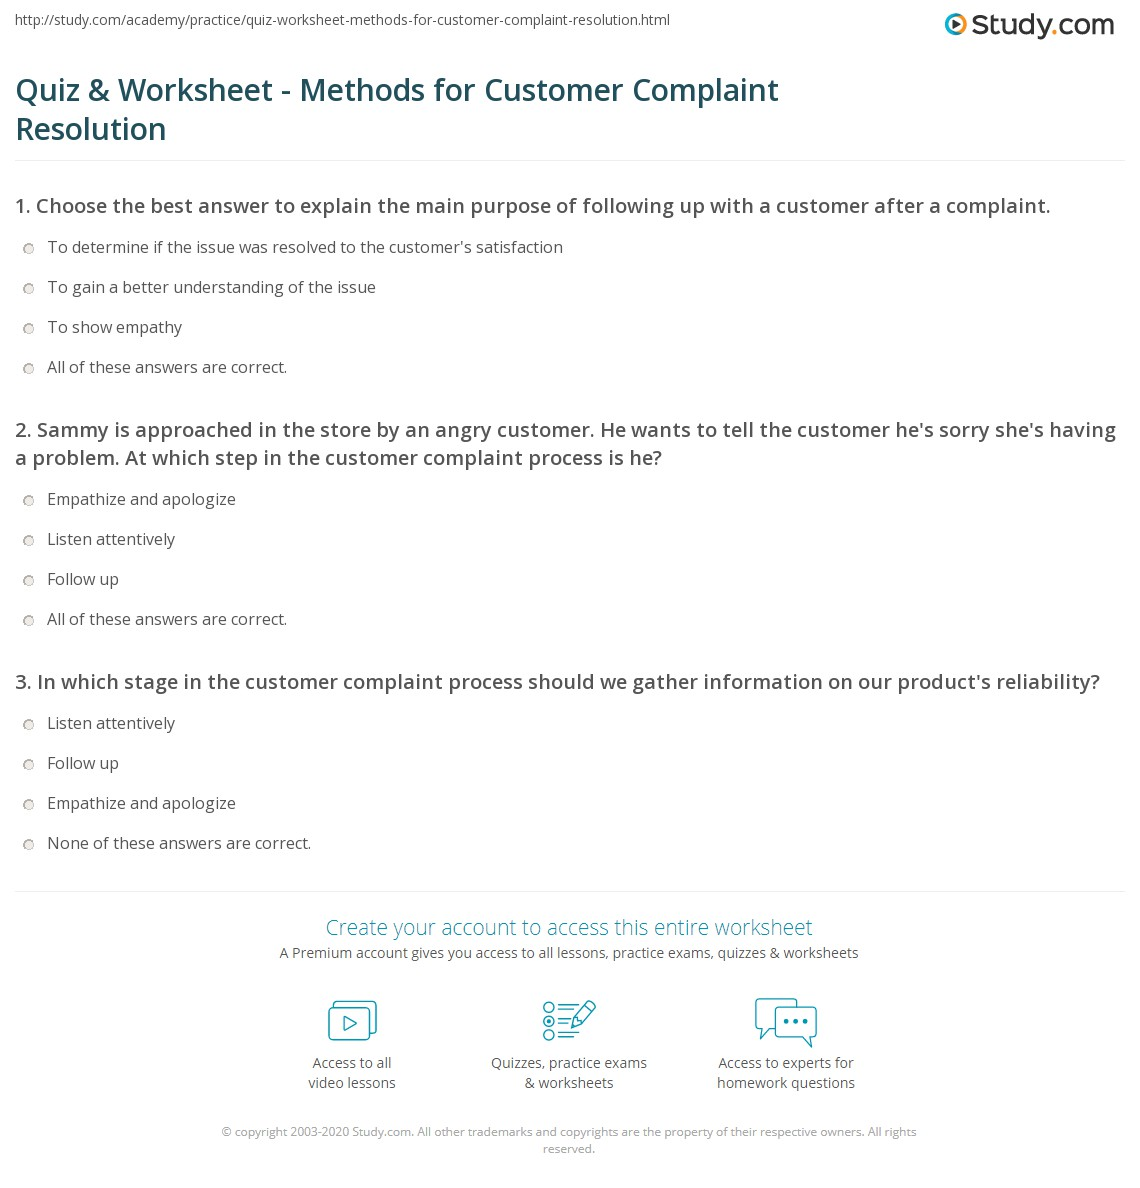 Workbooks workbook methods : Quiz & Worksheet - Methods for Customer Complaint Resolution ...